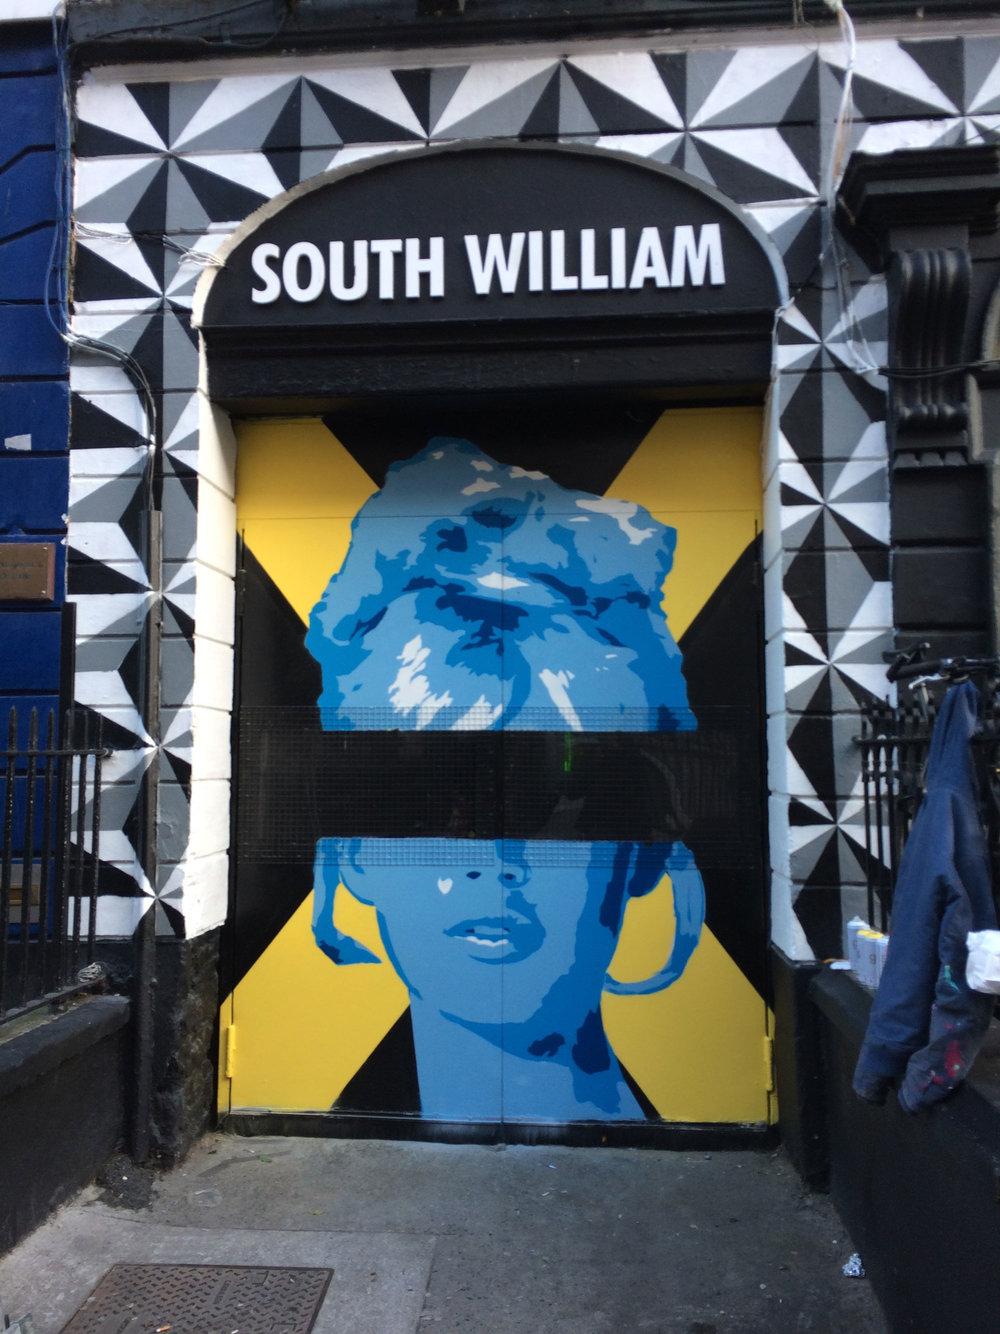 Southwilliam-1.jpg